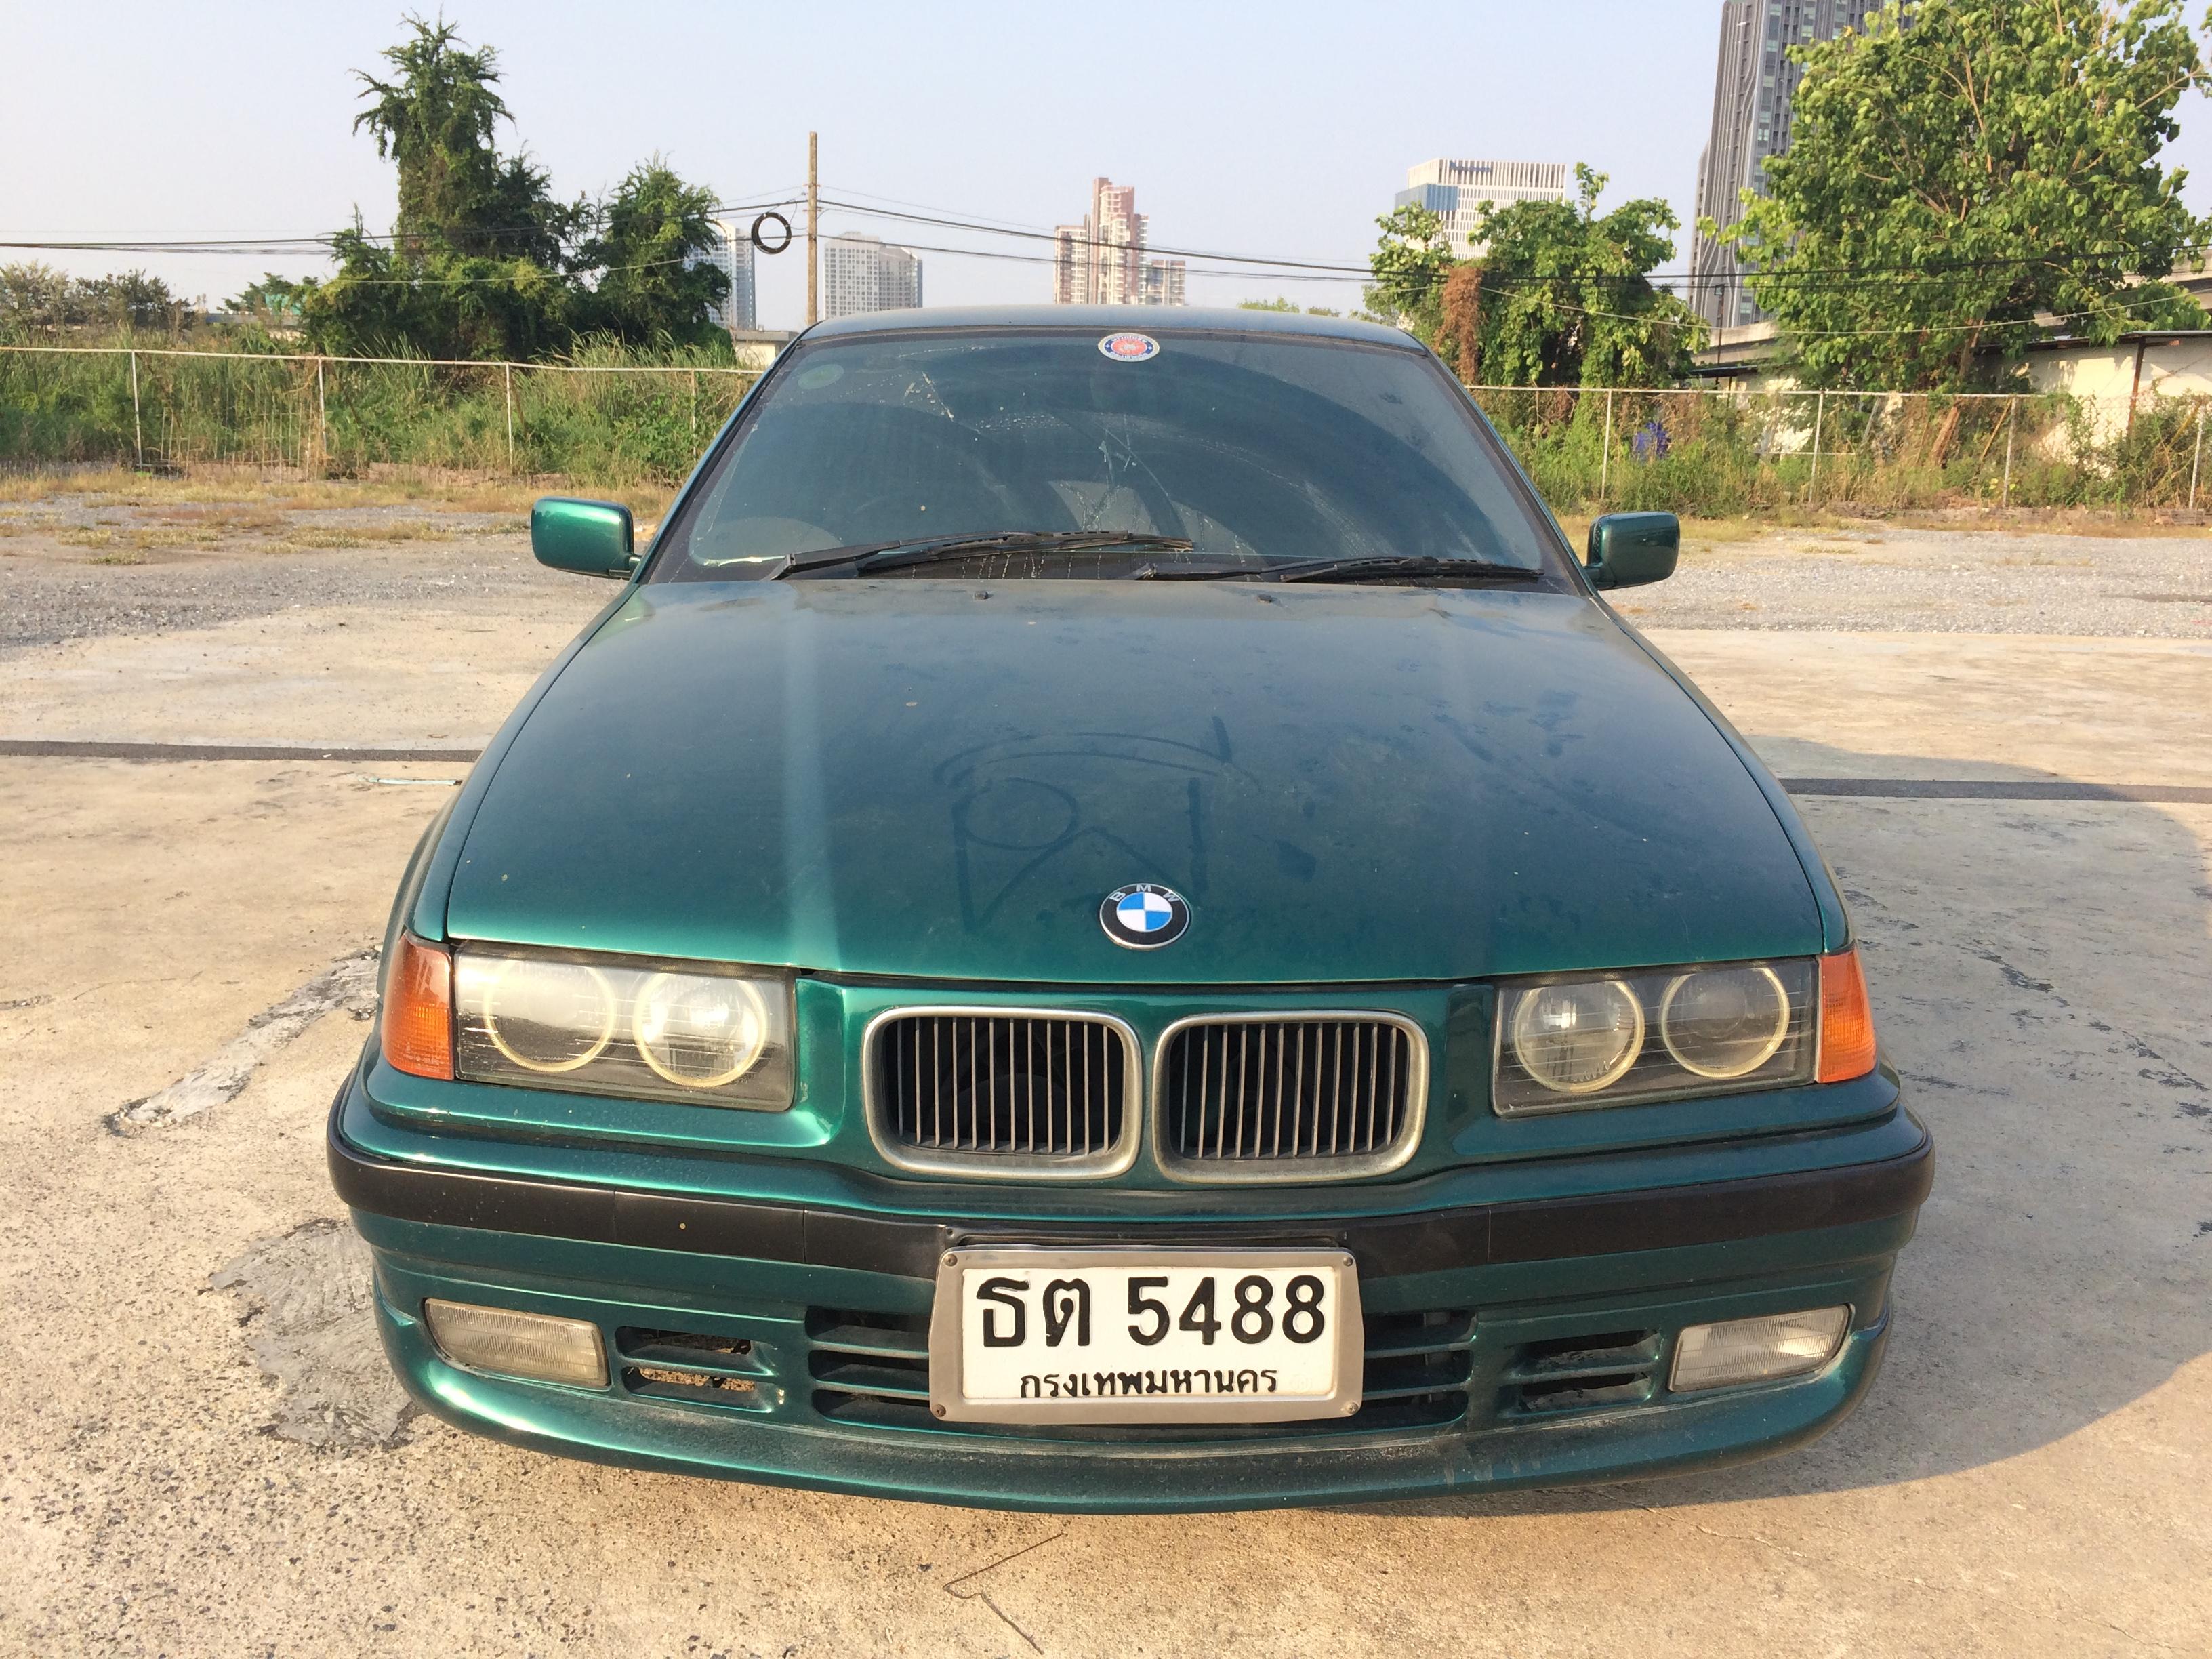 File 1995 1996 Bmw 318i E36 Sedan 22 02 2018 07 Jpg Wikimedia Commons